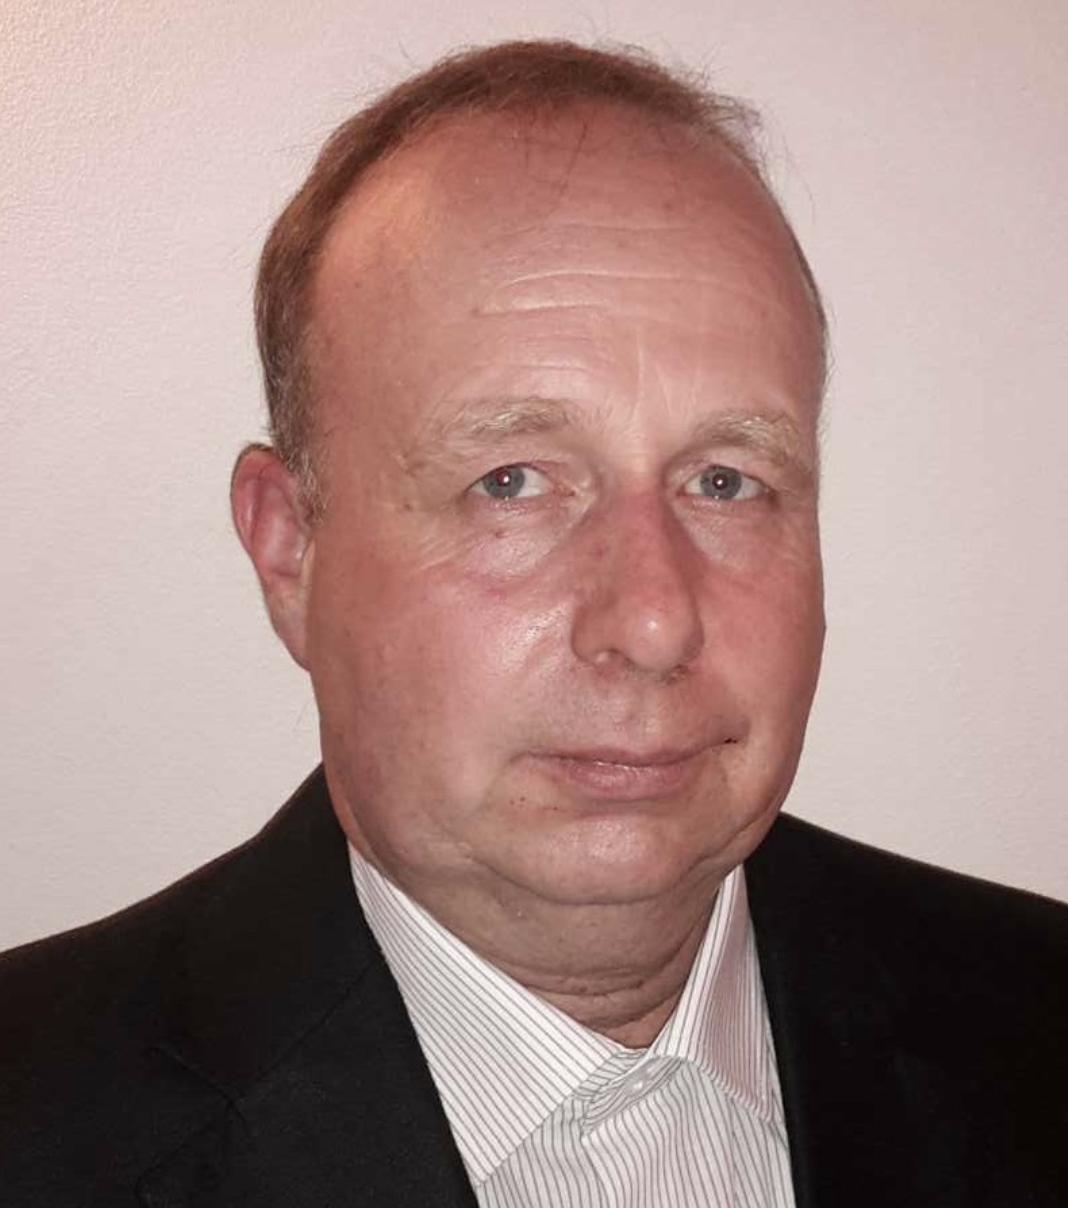 Poul Skjærbæk